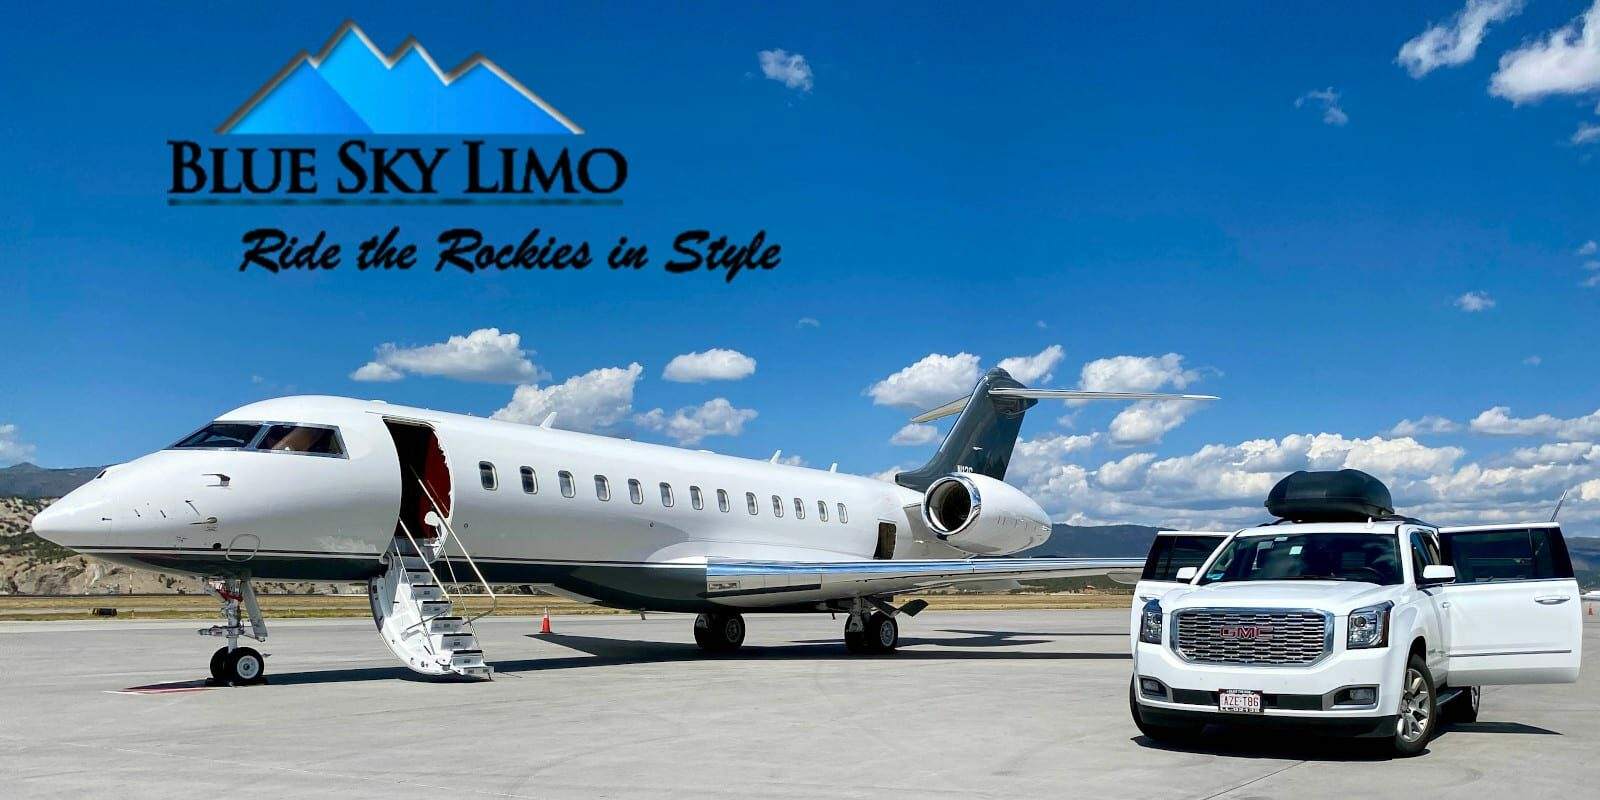 Blue Sky Limo - DIA to Avon Shuttle